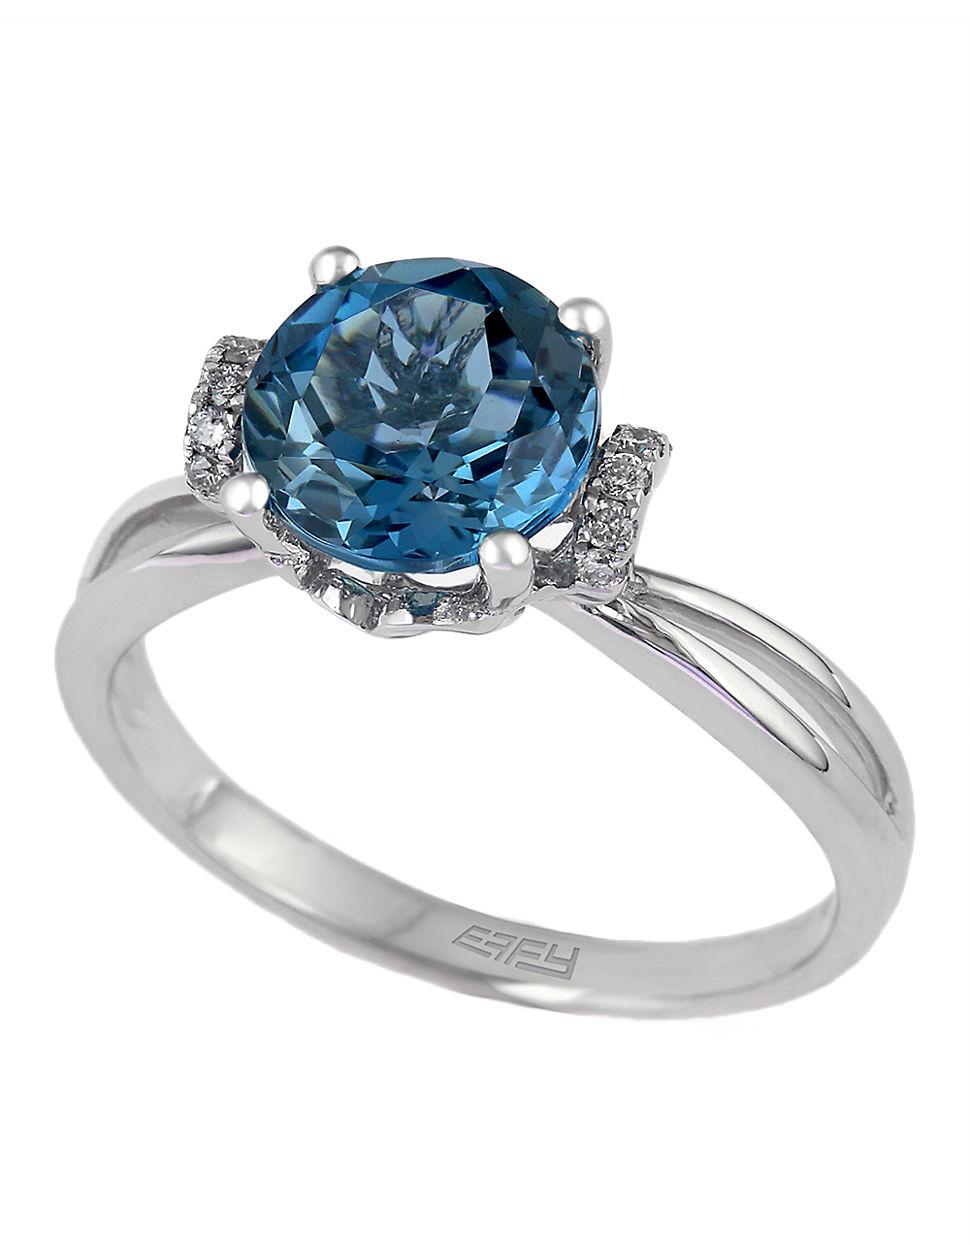 Effy London Blue Topaz Ring